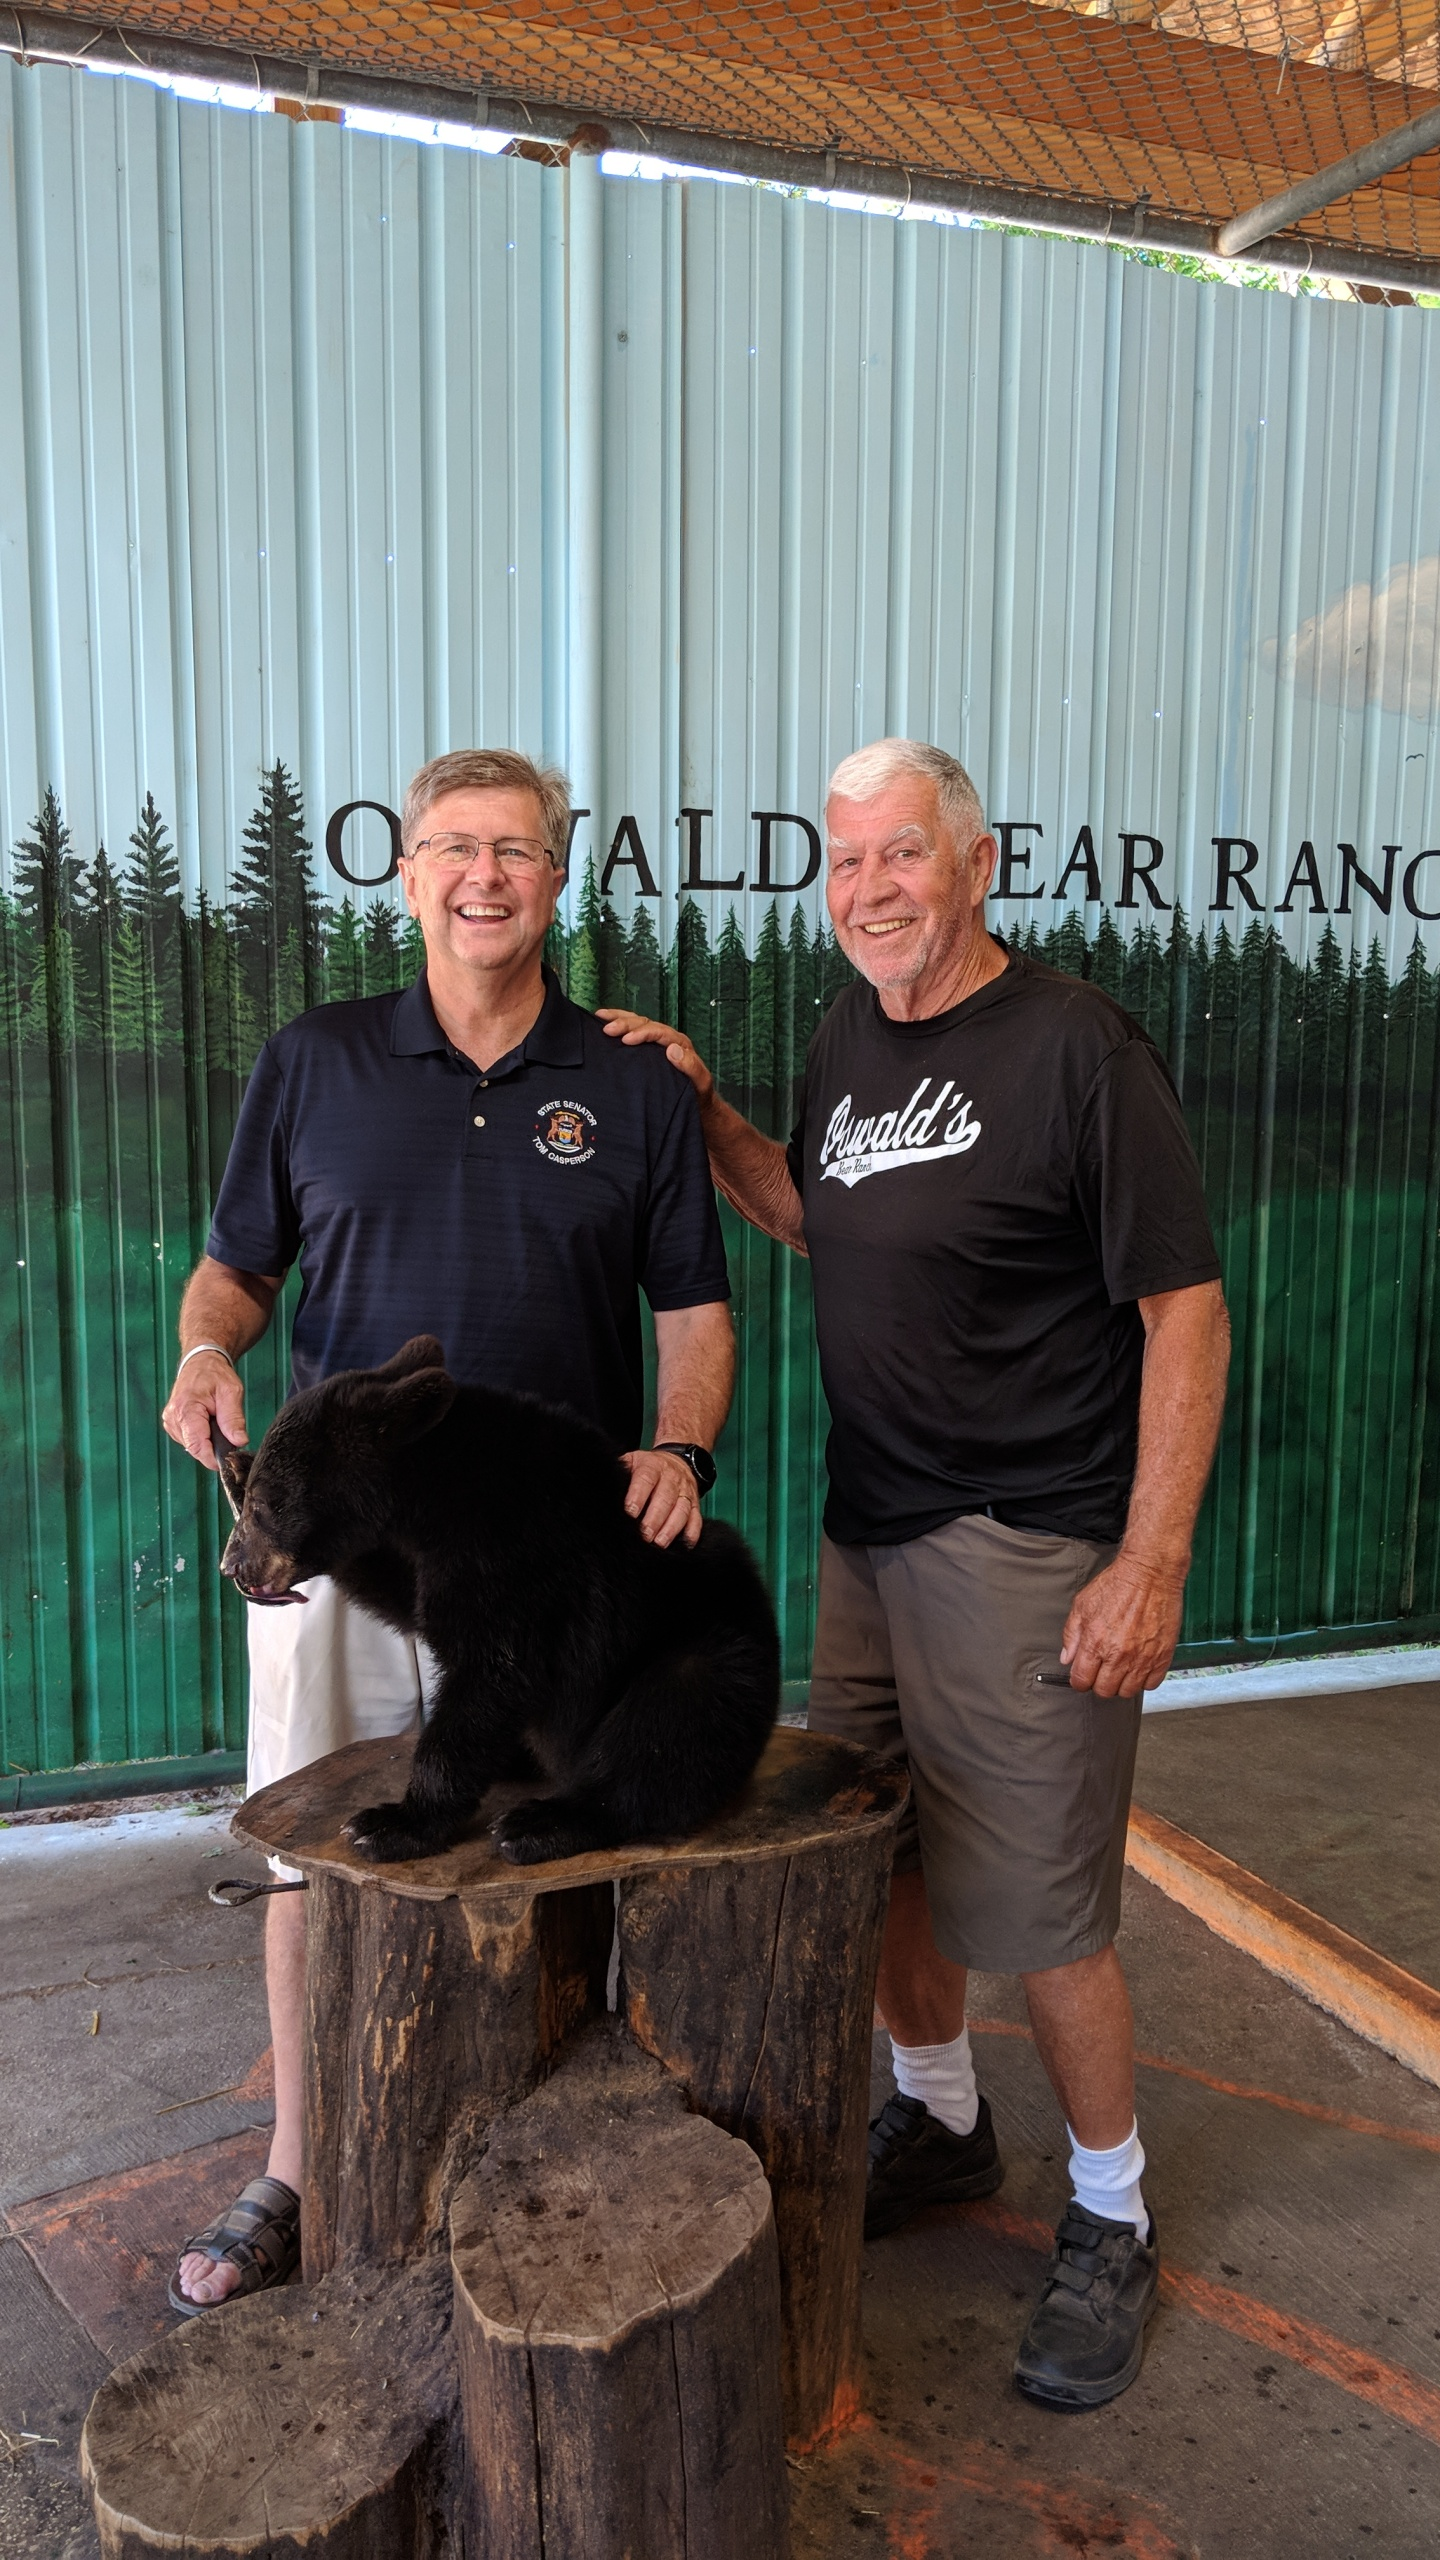 Sen. Casperson at Oswald's Bear Ranch